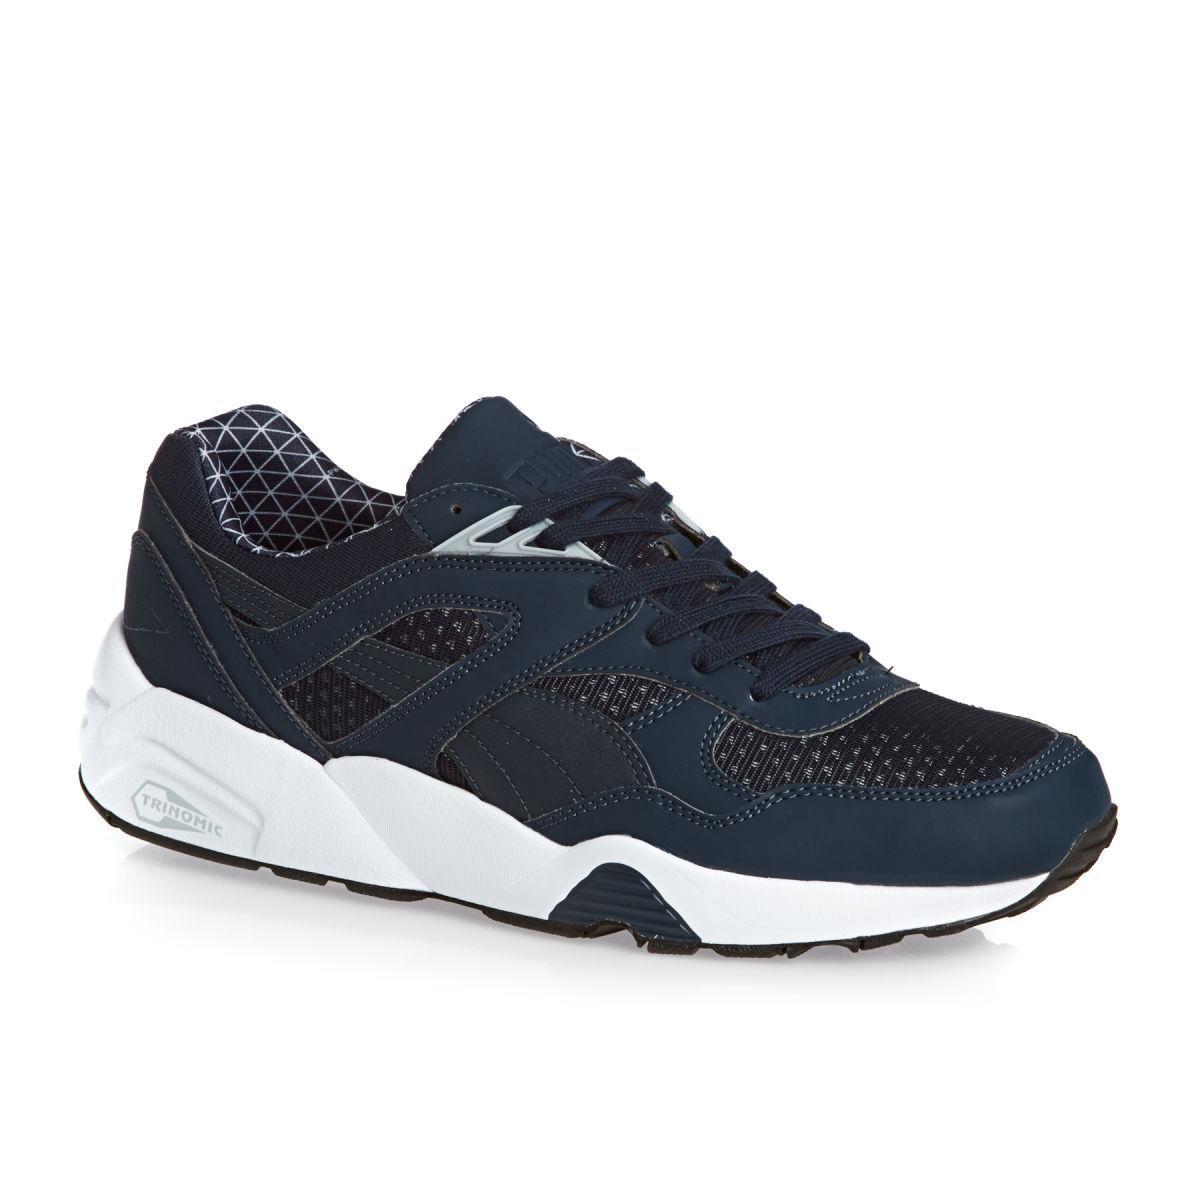 Chaussures Puma R698 LS Shoe